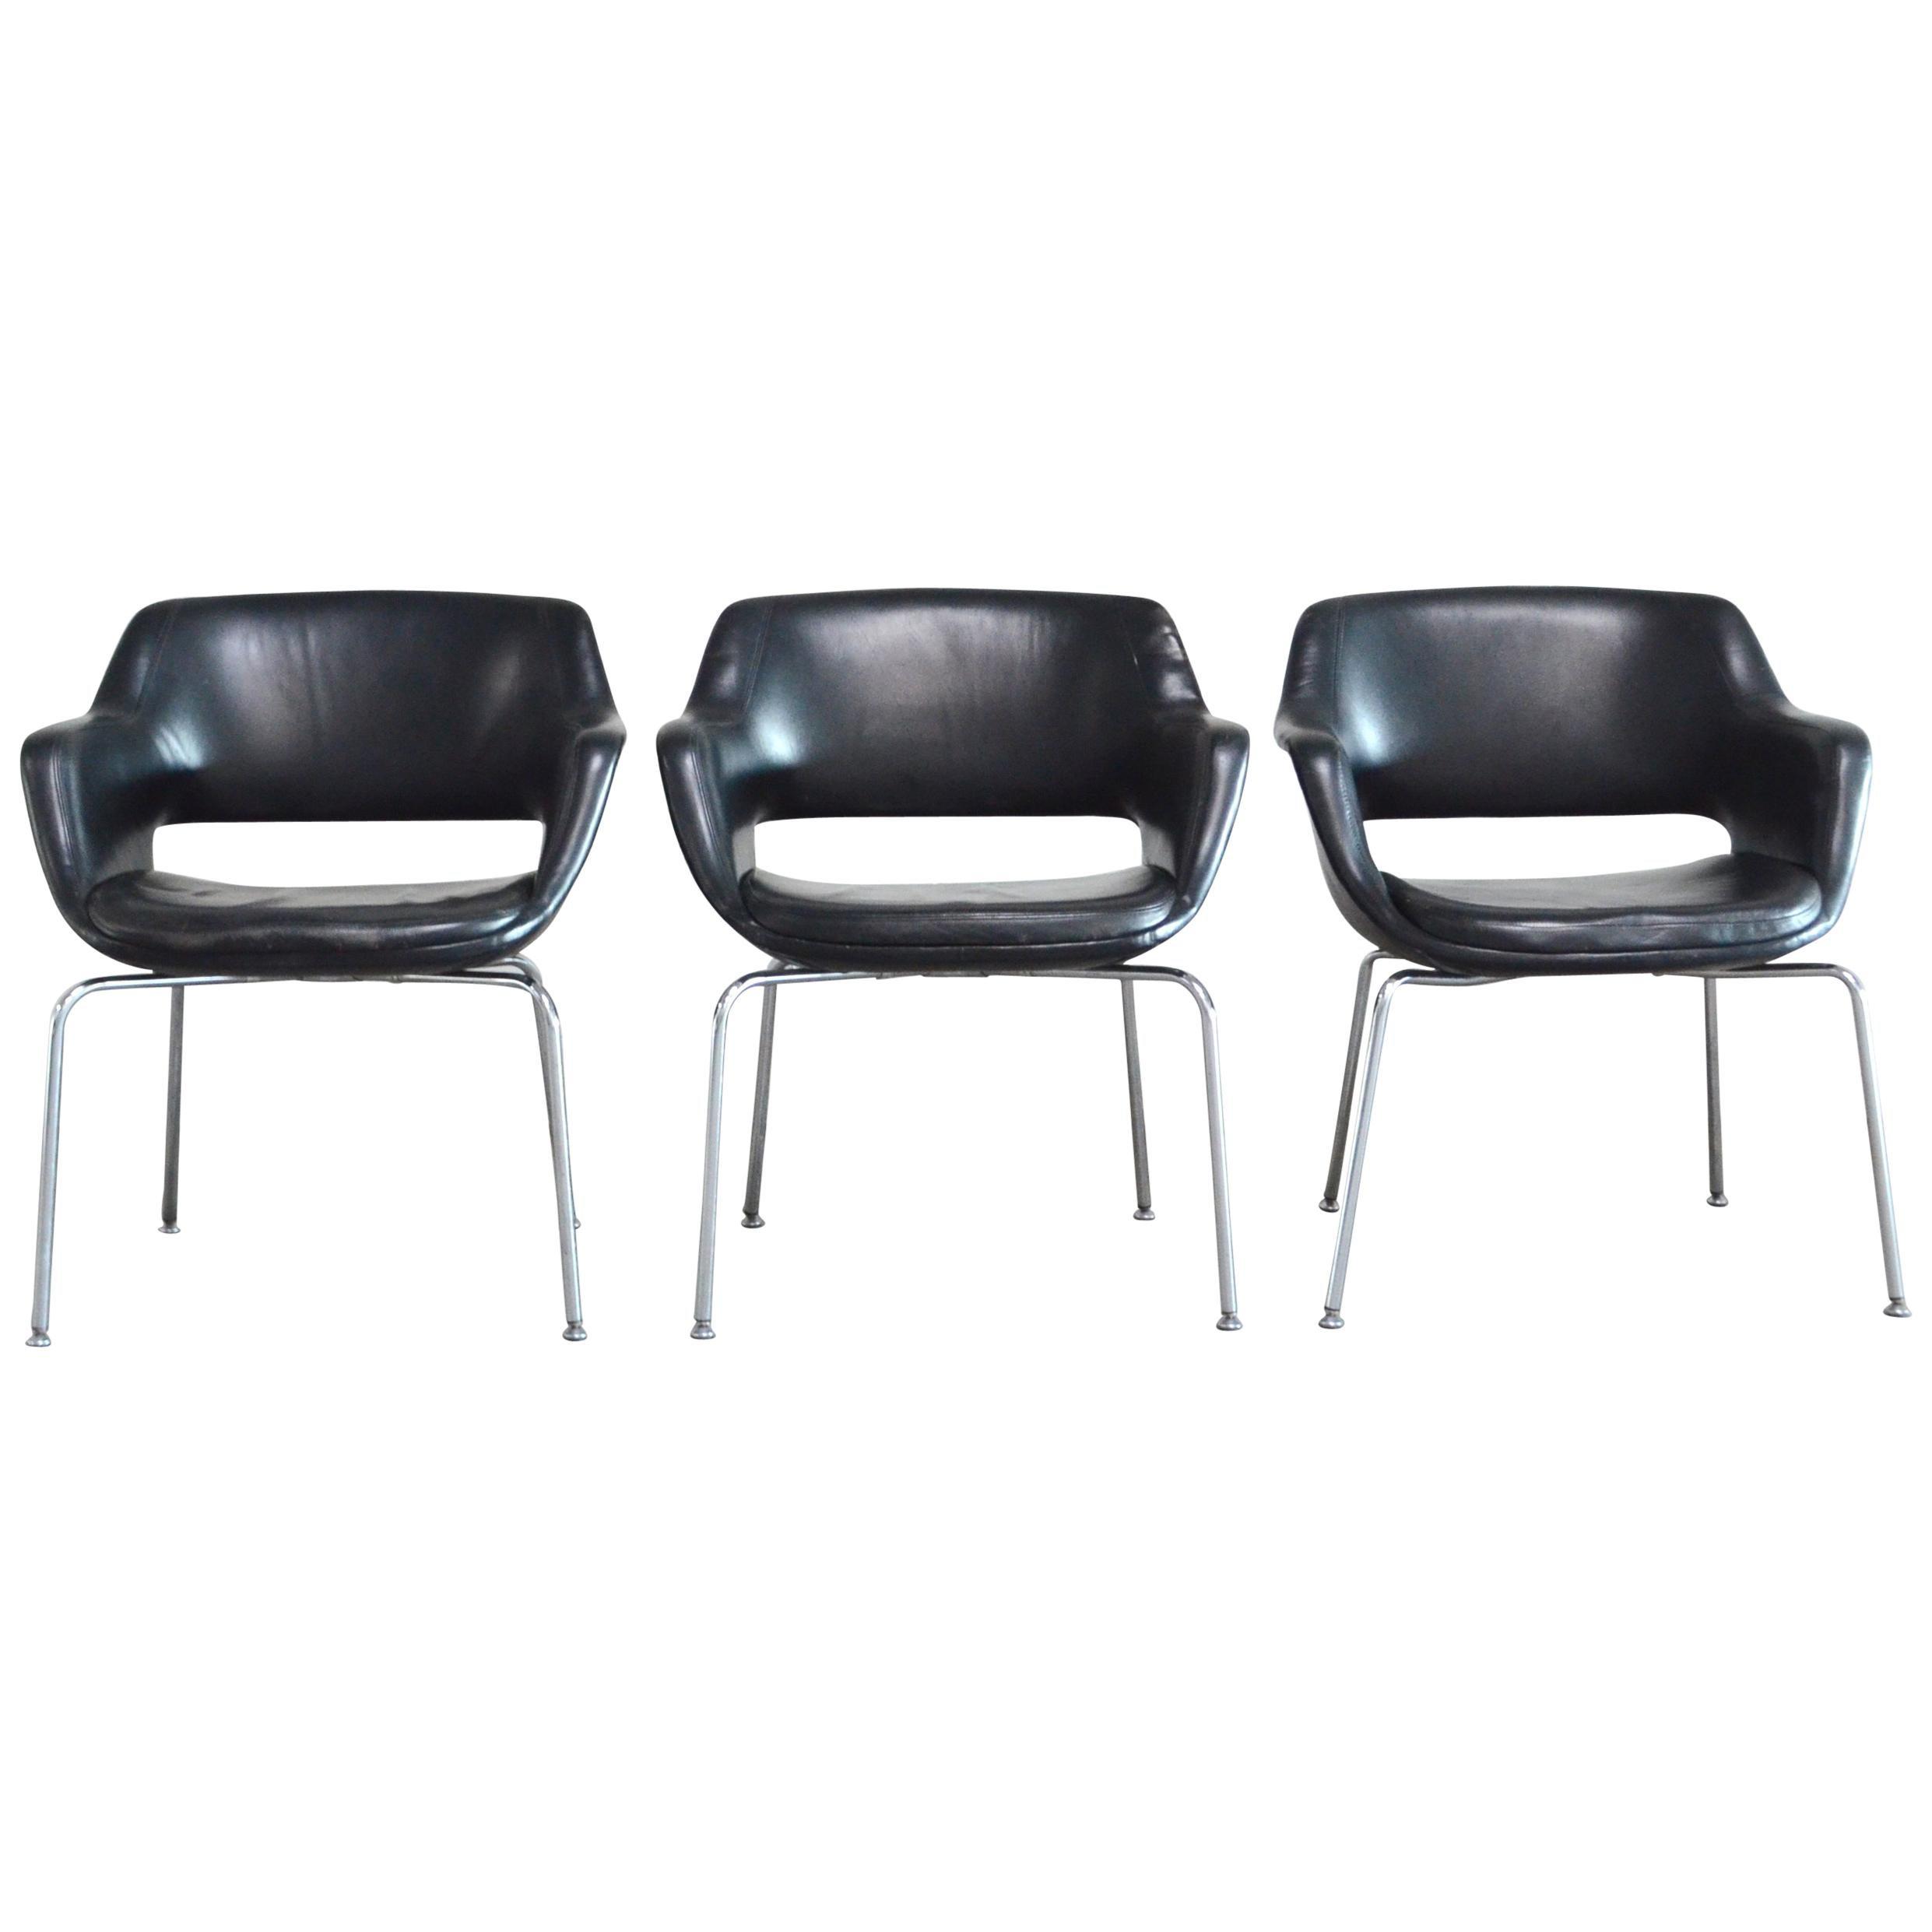 Olli Mannermaa  3 Leather Kilta Chair by Eugen Schmidt & Cassina Martela